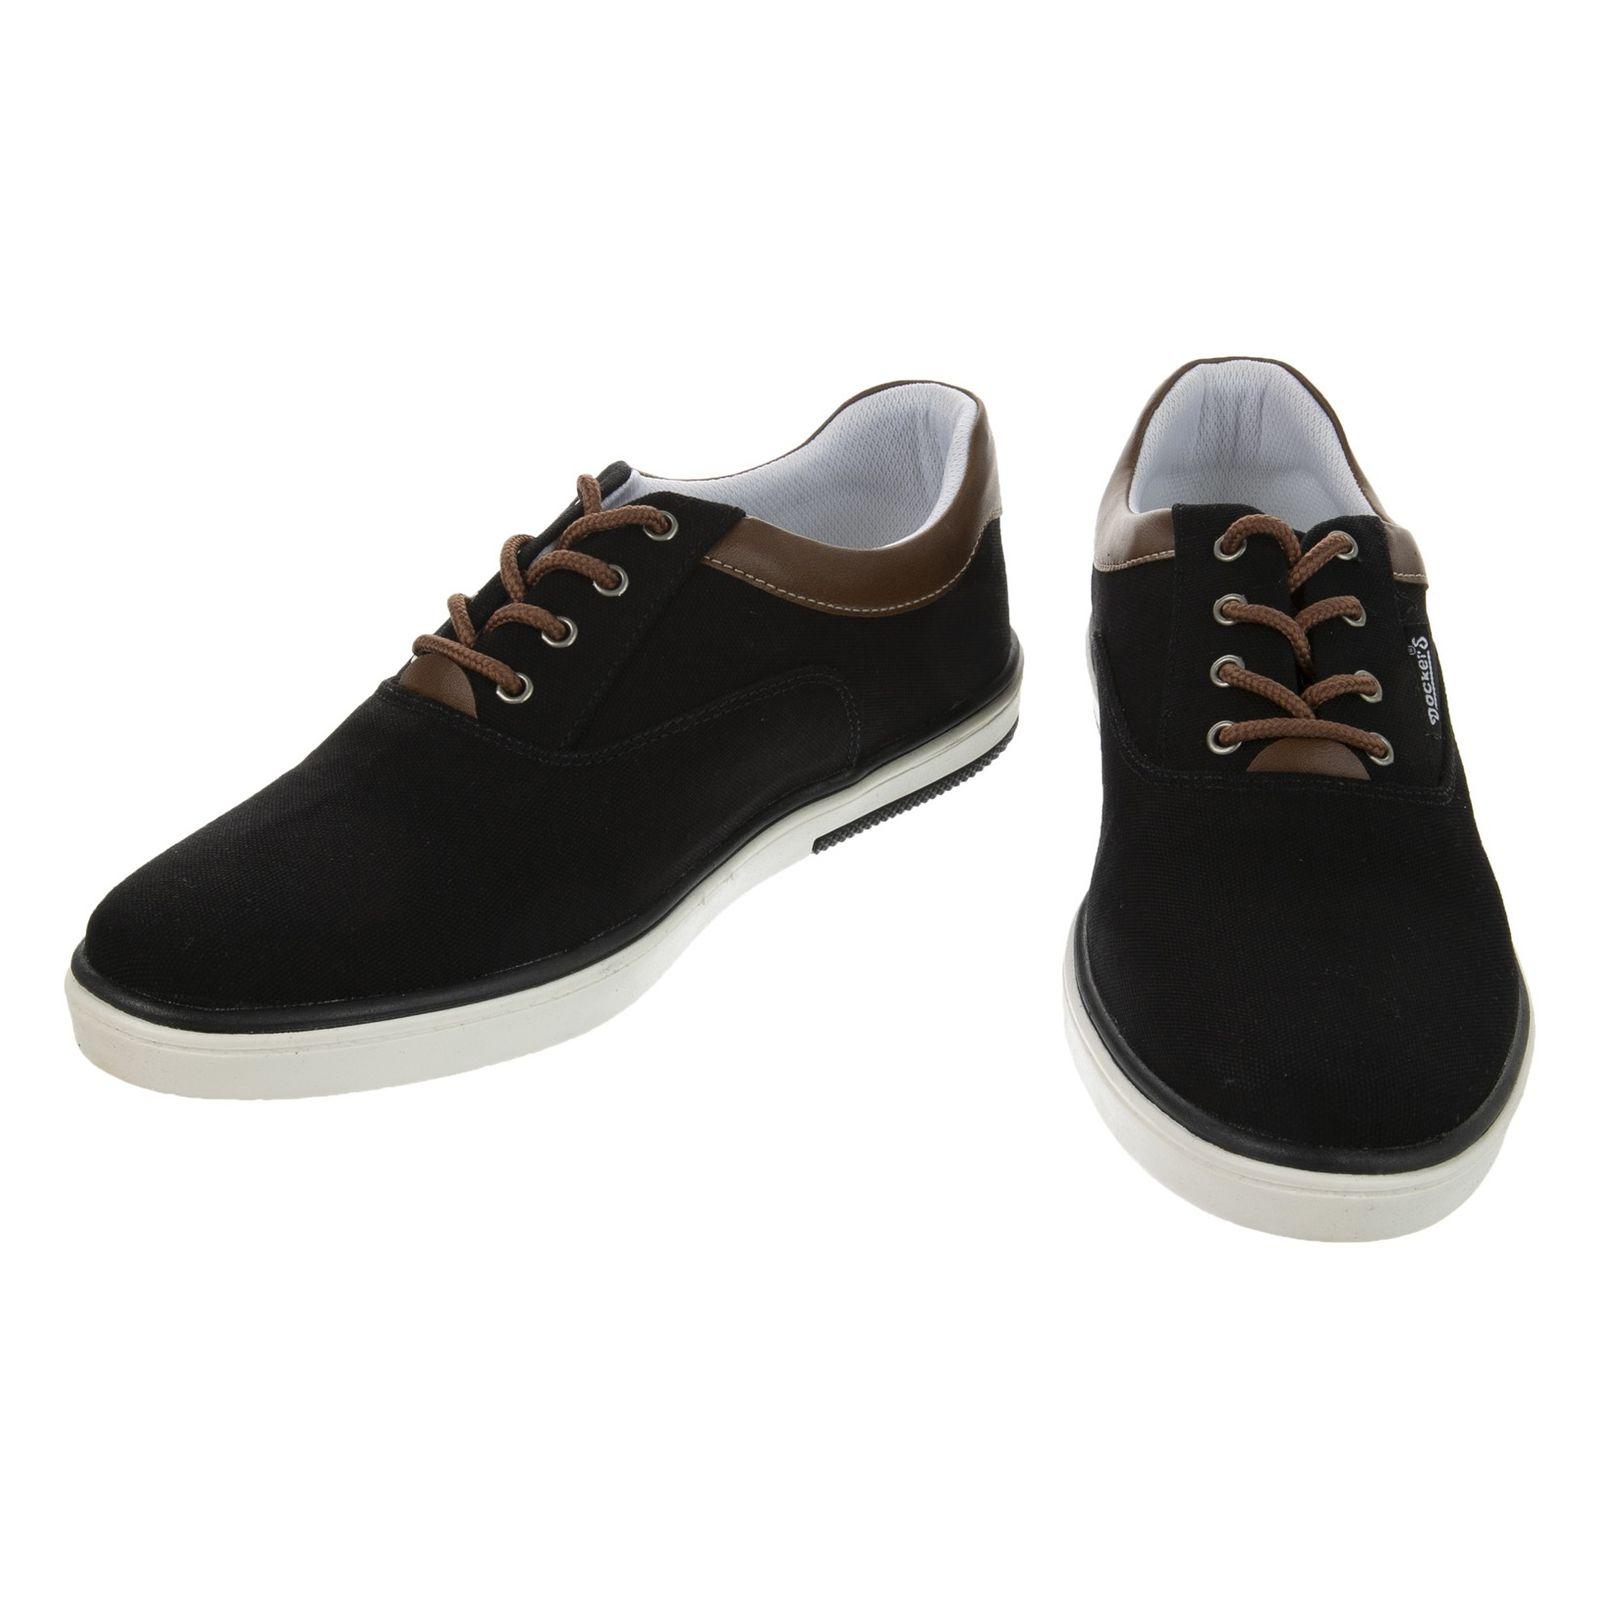 کفش روزمره مردانه داکرز مدل 100234016-BL -  - 3